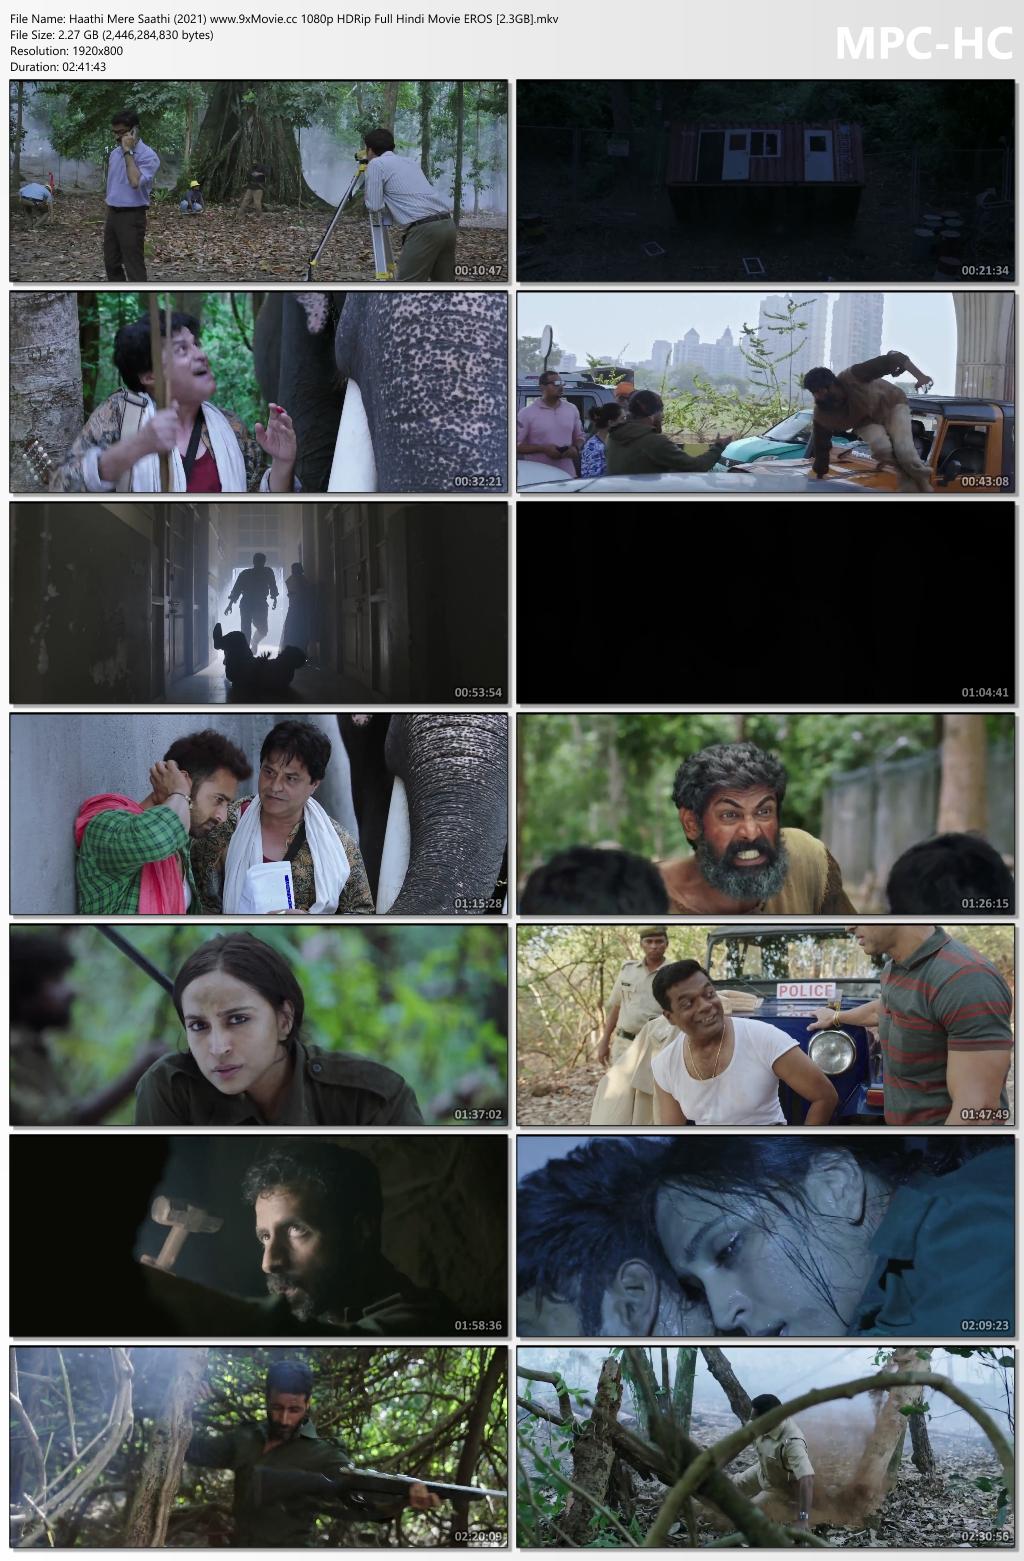 Haathi-Mere-Saathi-2021-www-9x-Movie-cc-1080p-HDRip-Full-Hindi-Movie-EROS-2-3-GB-mkv